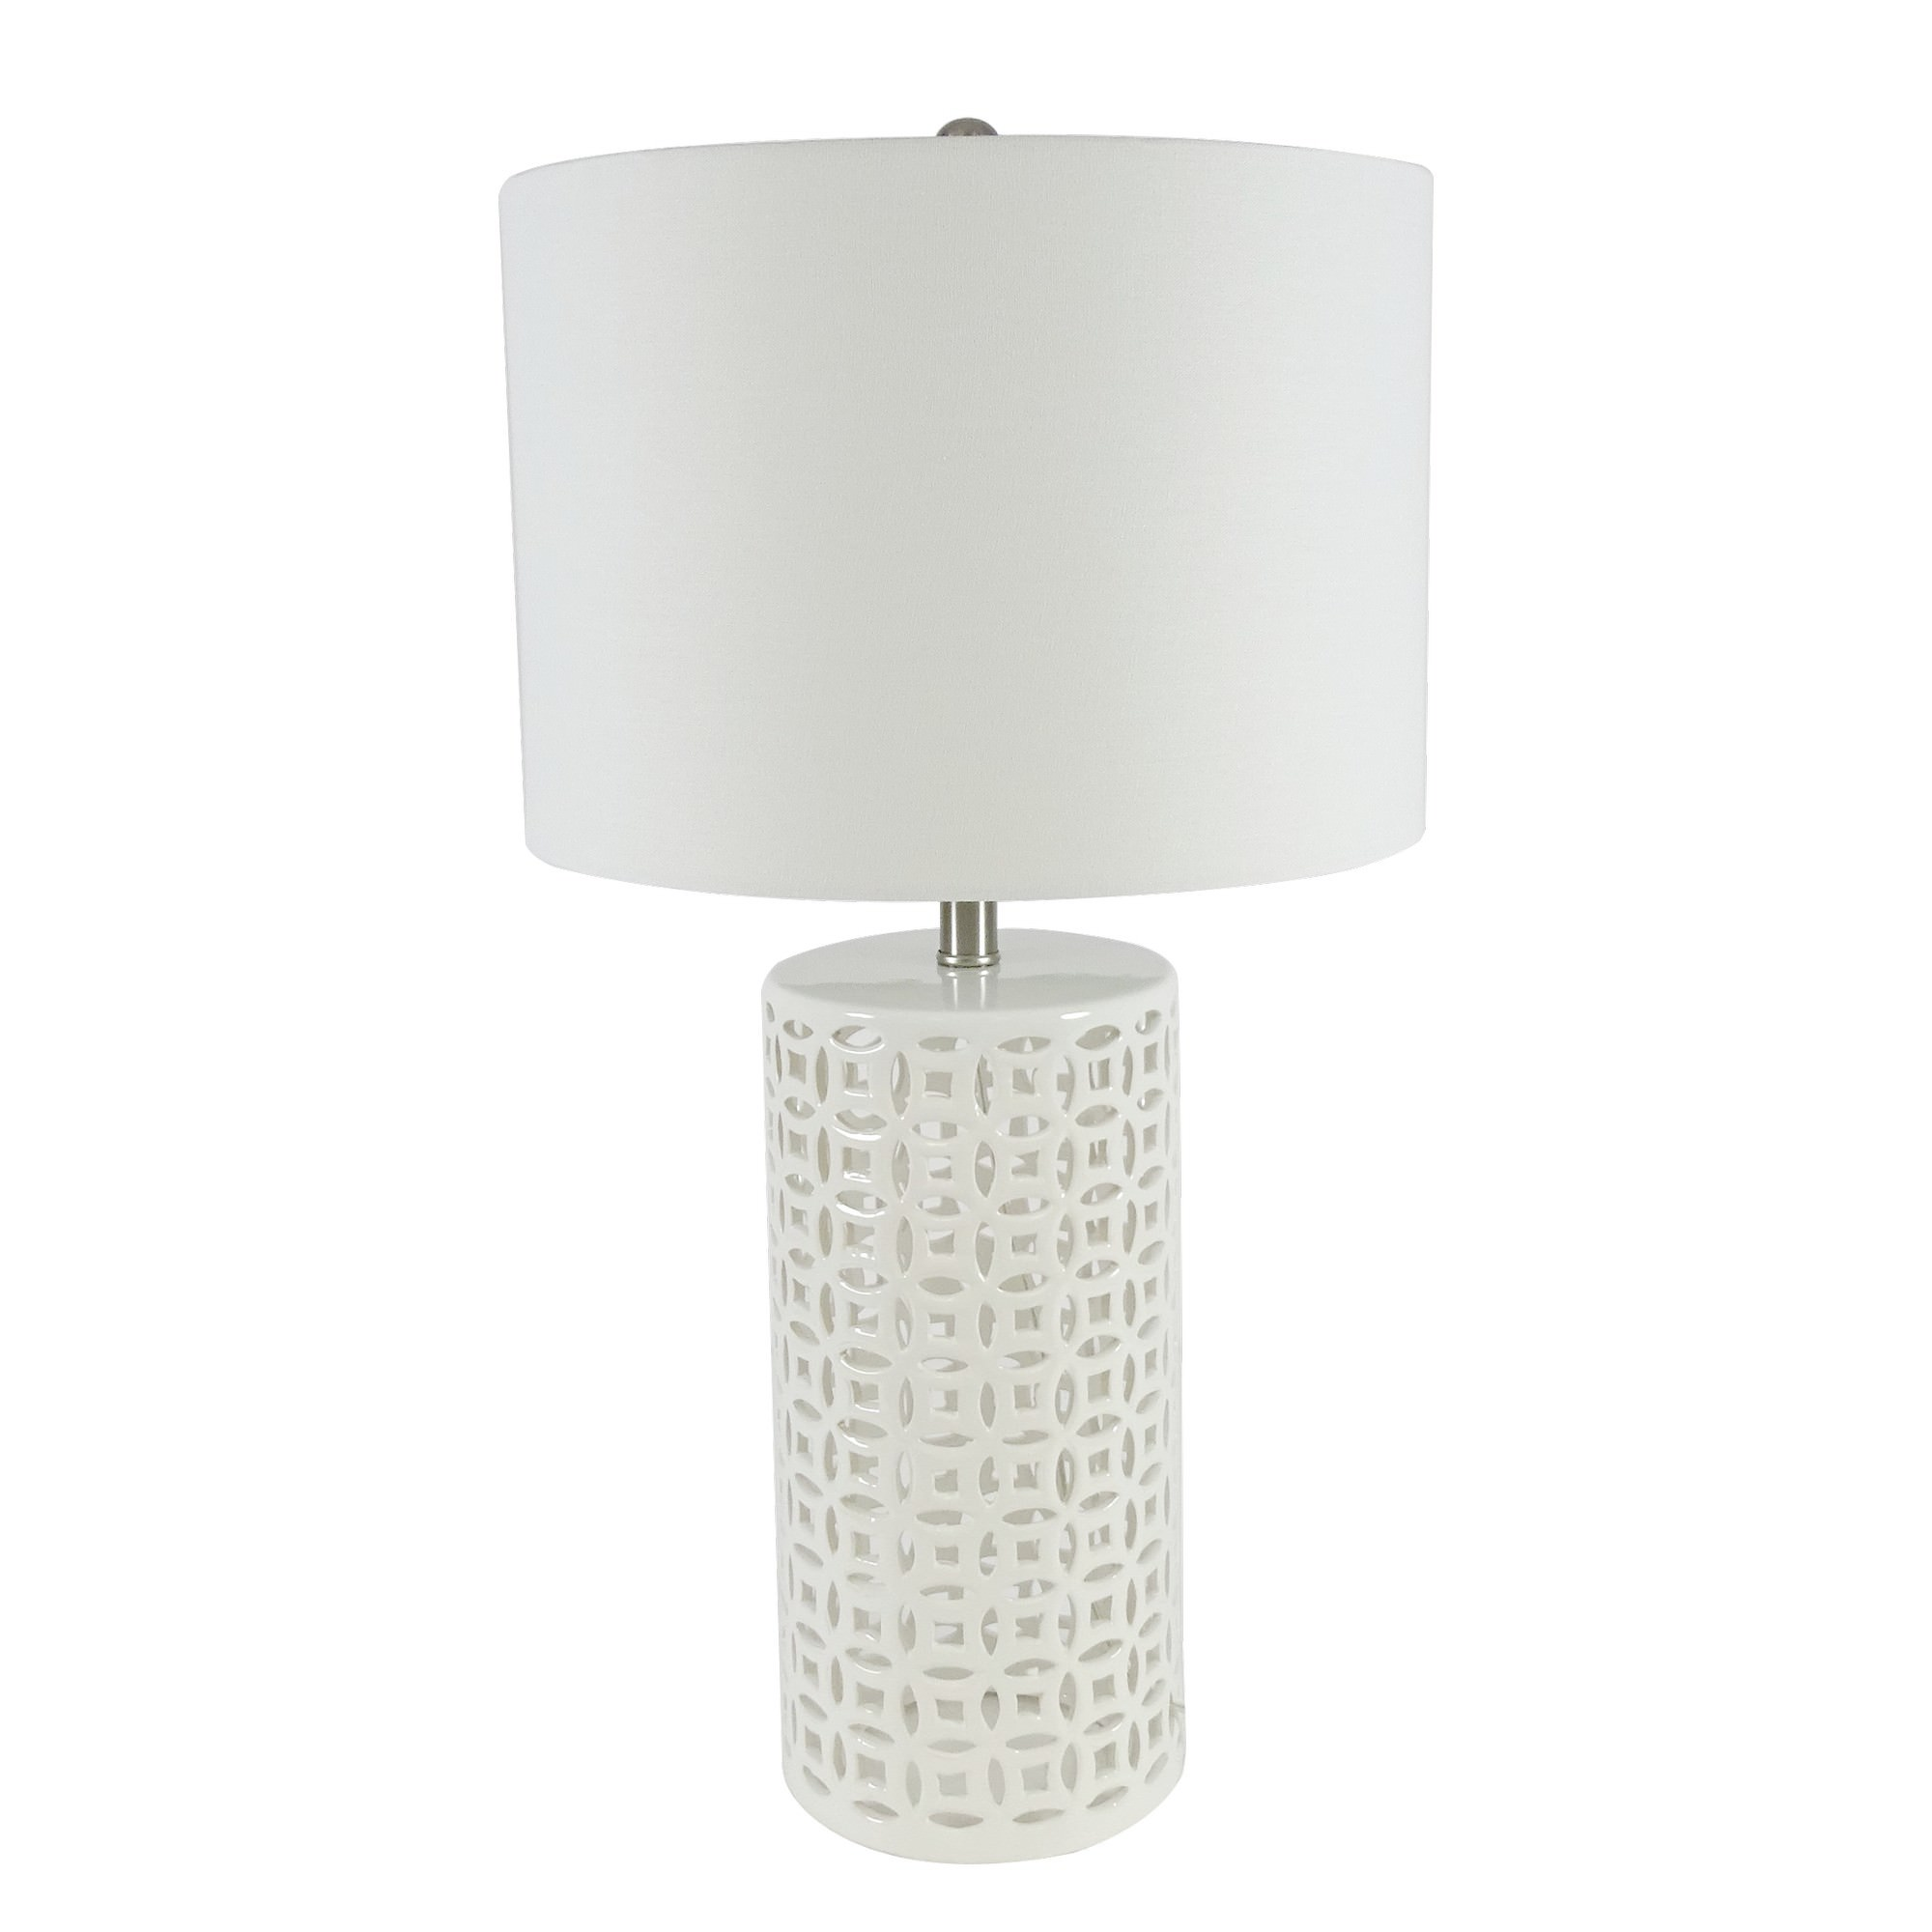 Bianca Ceramic Base Table Lamp